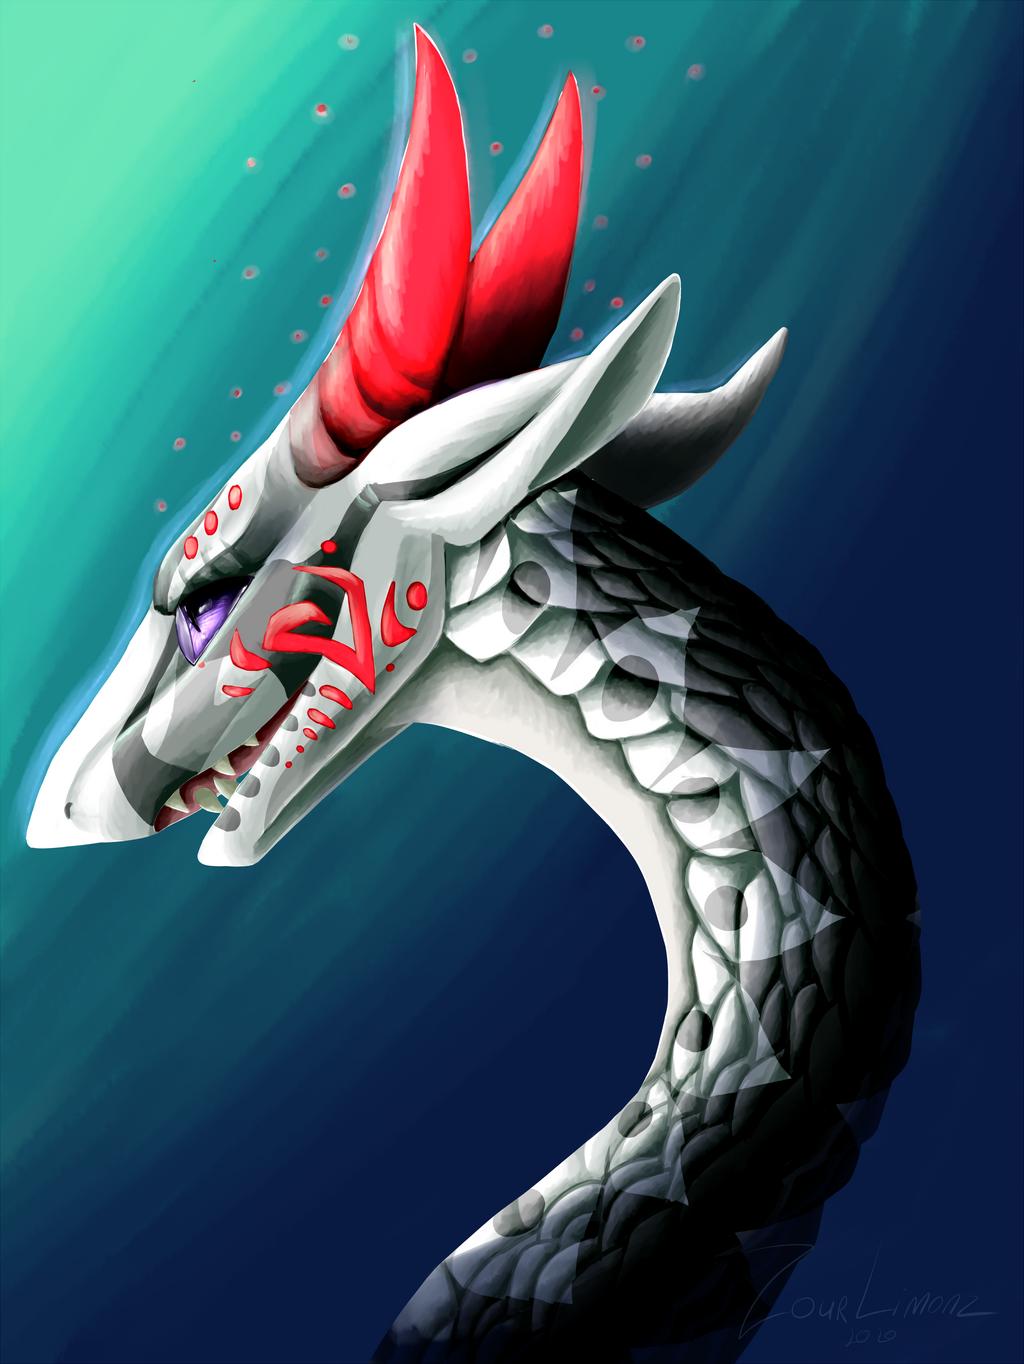 Most recent image: Febrael - Rune Spiral Dragon